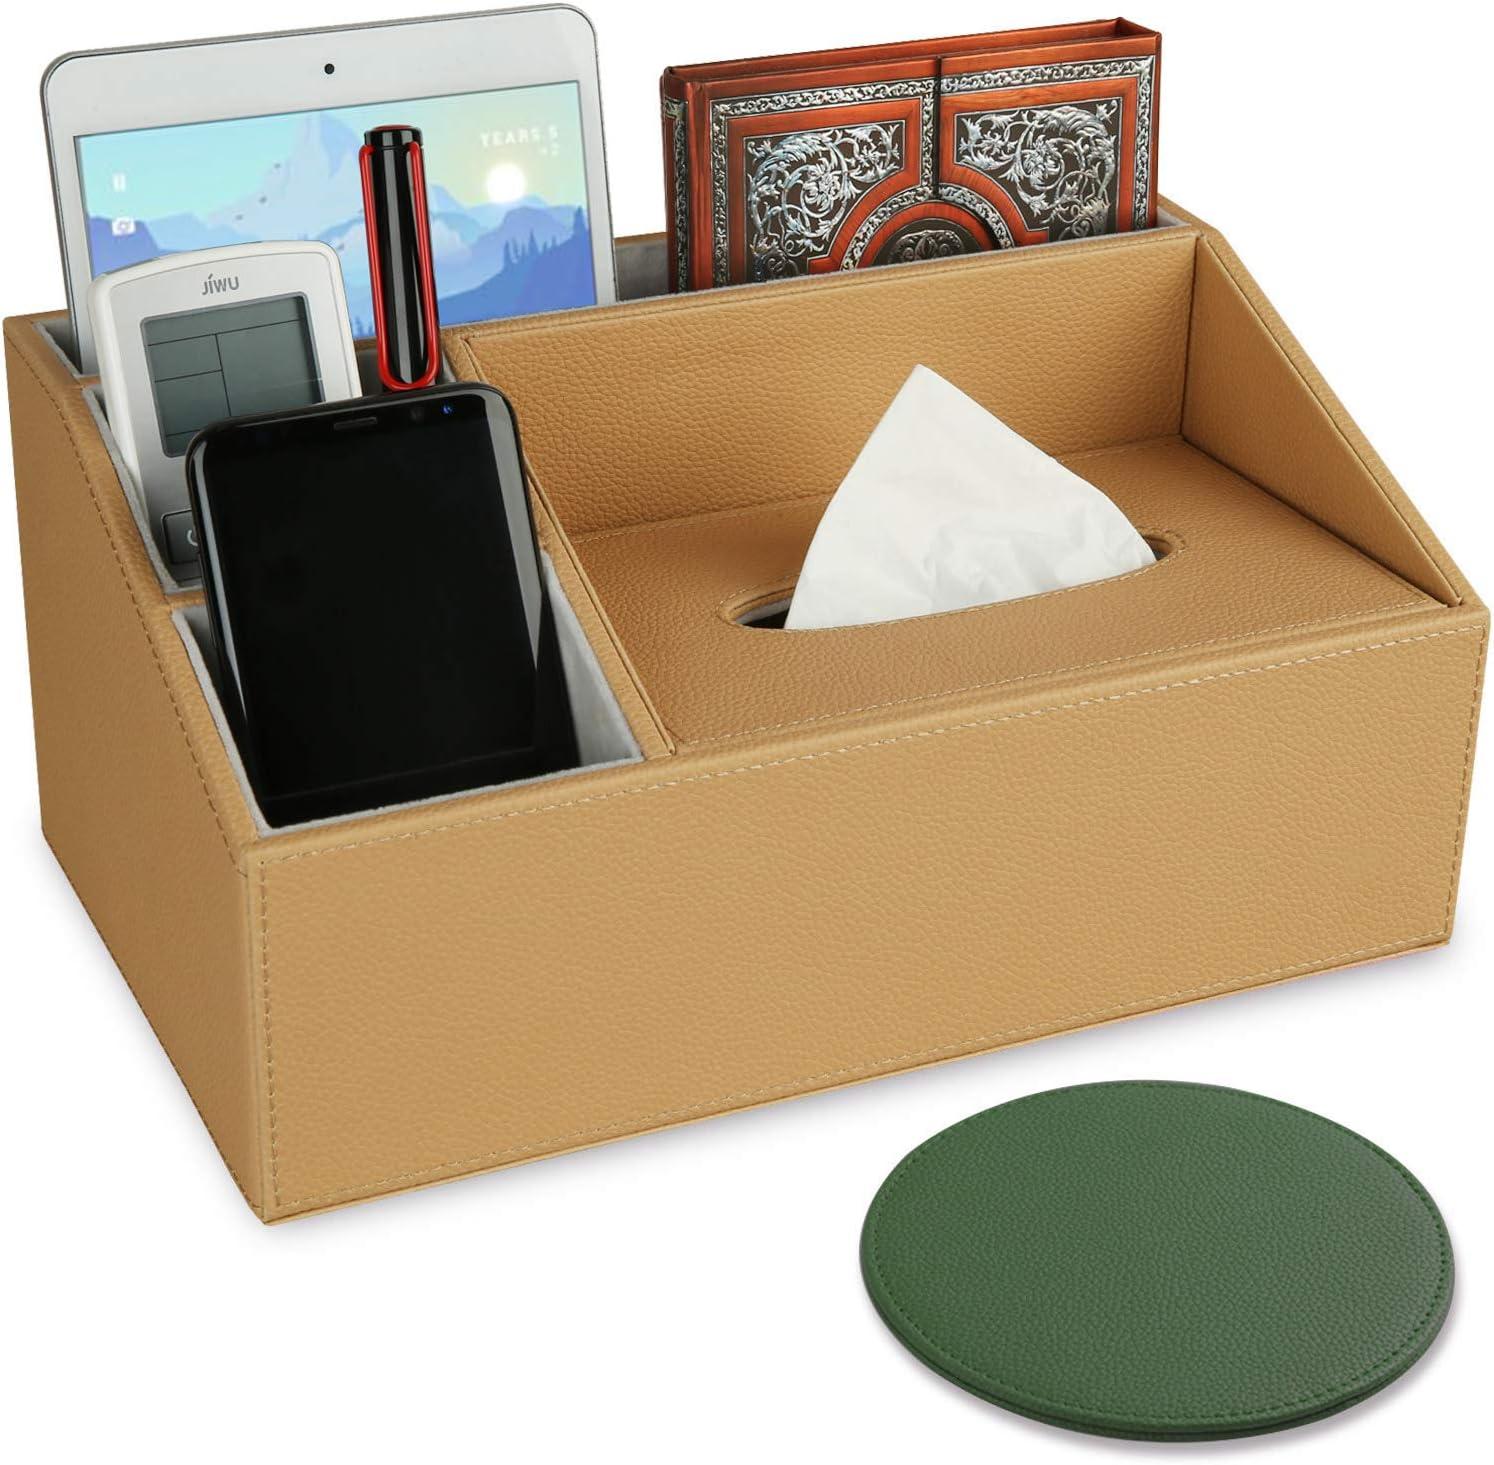 Sunewlx Desk Organizer/Tissue Box, Handmade Premium Leather Desktop Organizer with Tissue Box for a Neat Workspace office & home, 4 Compartments & Large Capacity (Khaki - Tissue Box)